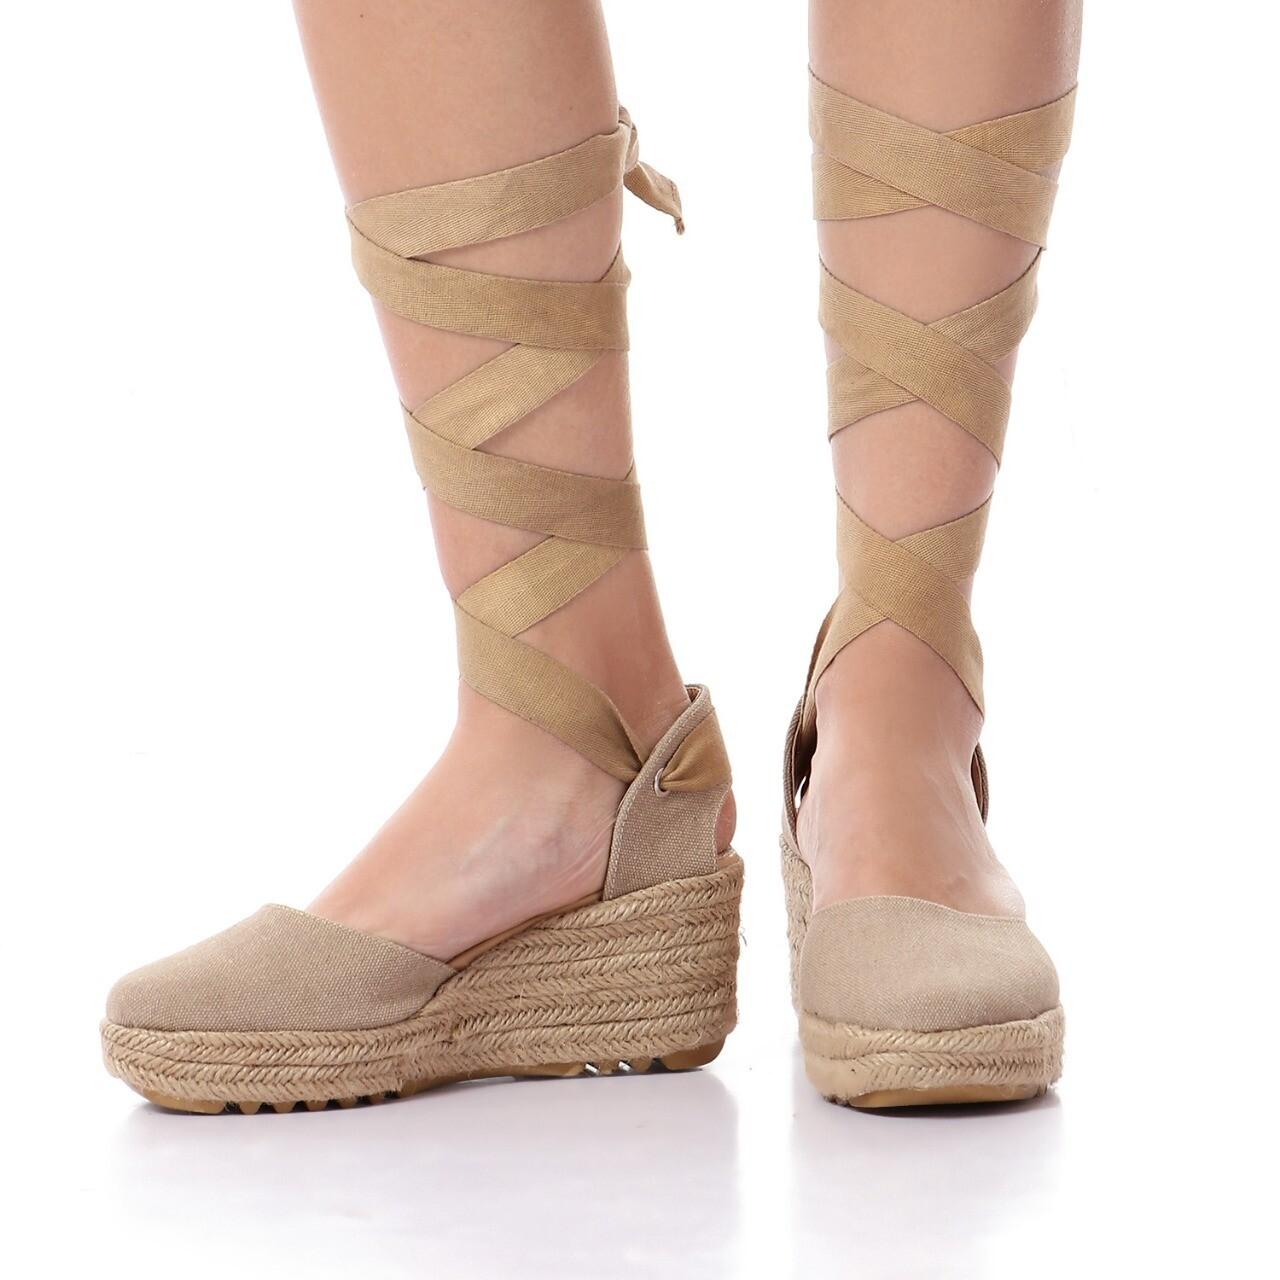 3394 Sandal - Beige